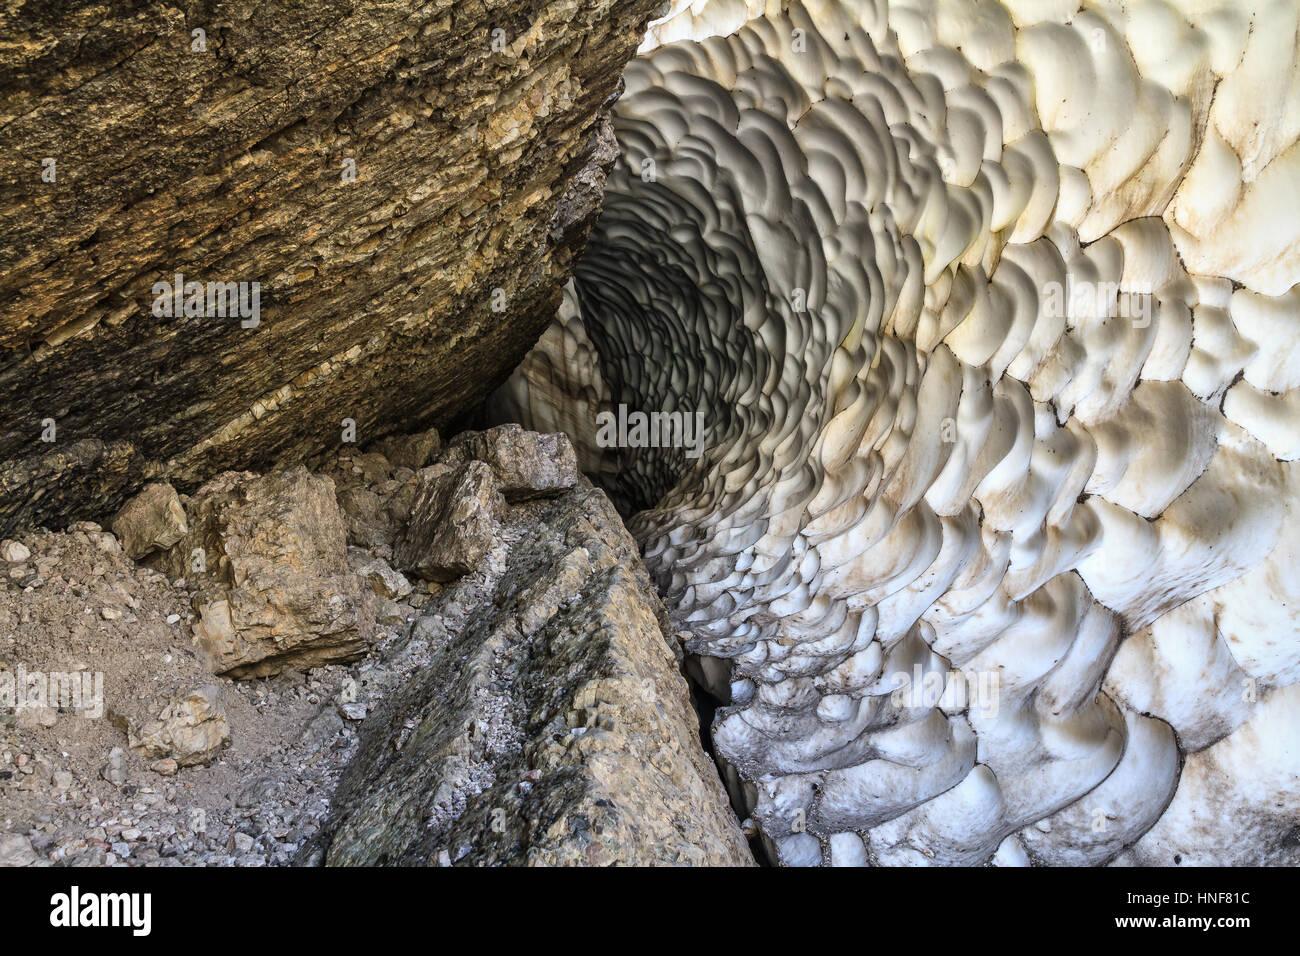 Dolomiti - tunnel between rocks and glacier called Grotta della Neve in Val Badia, Alto Adige, Italy - Stock Image